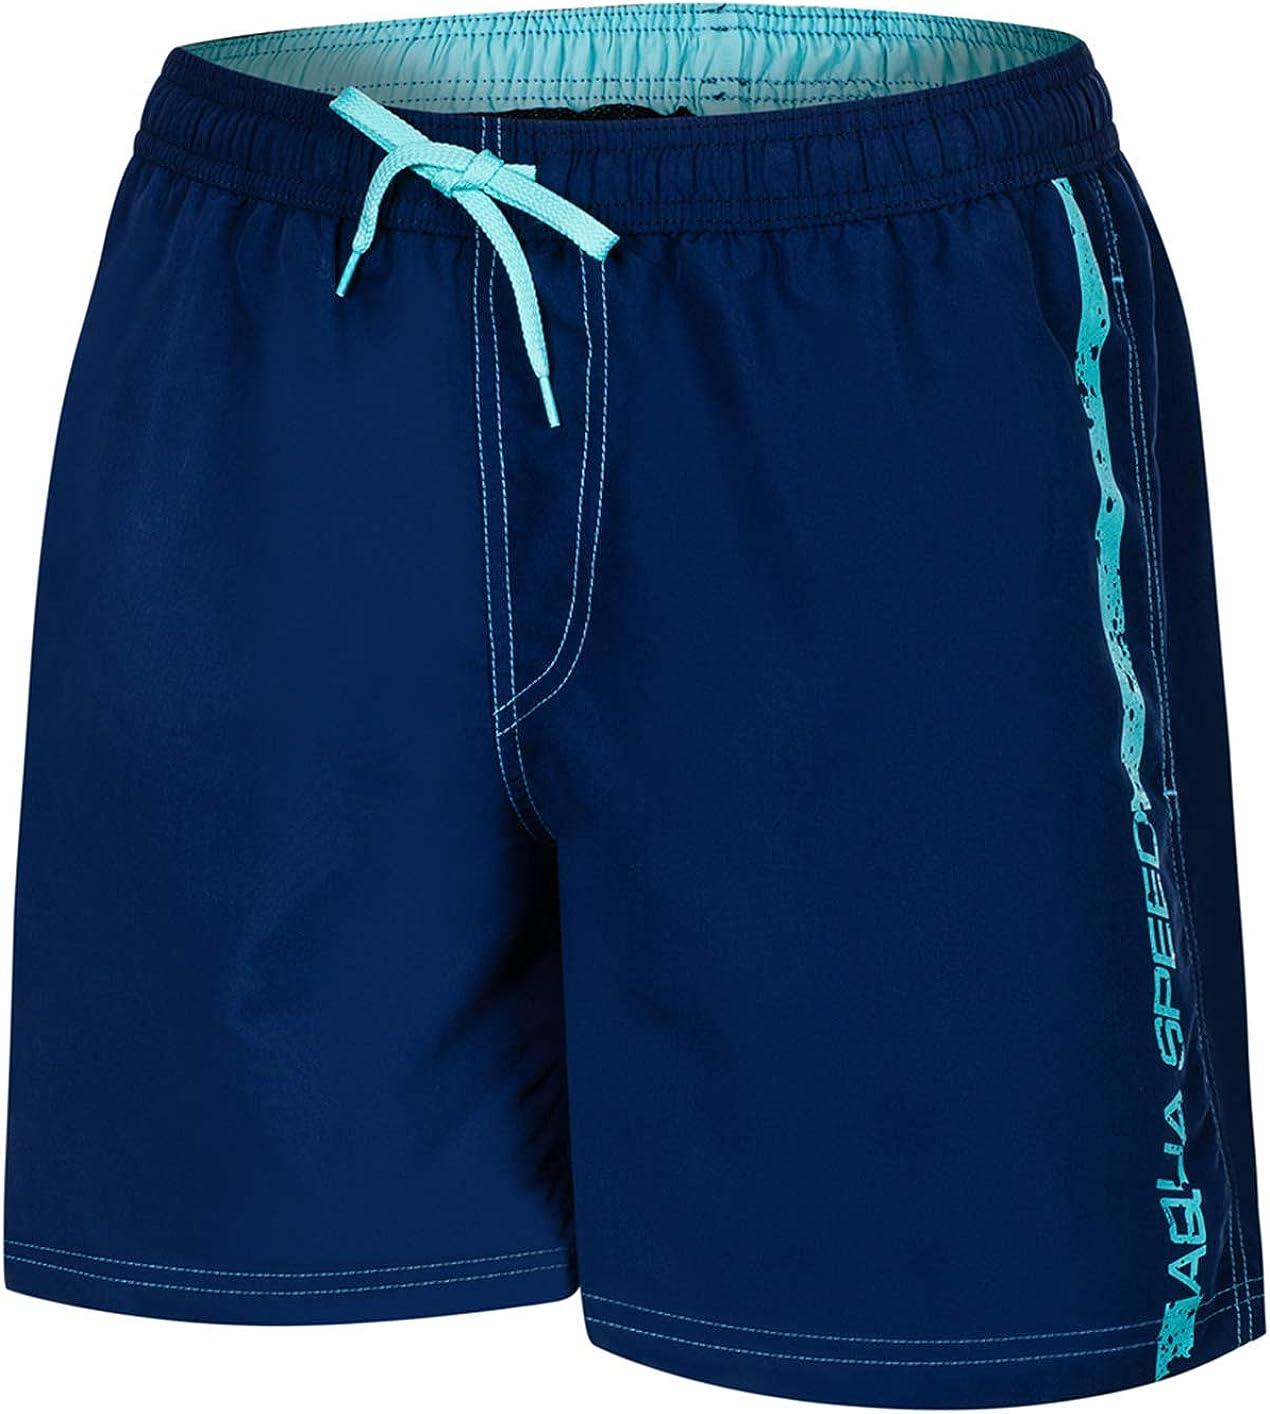 Aqua Speed 5908217667083 Ace Swim - Bañador para Hombre, Talla XL, Color Azul Marino y Azul